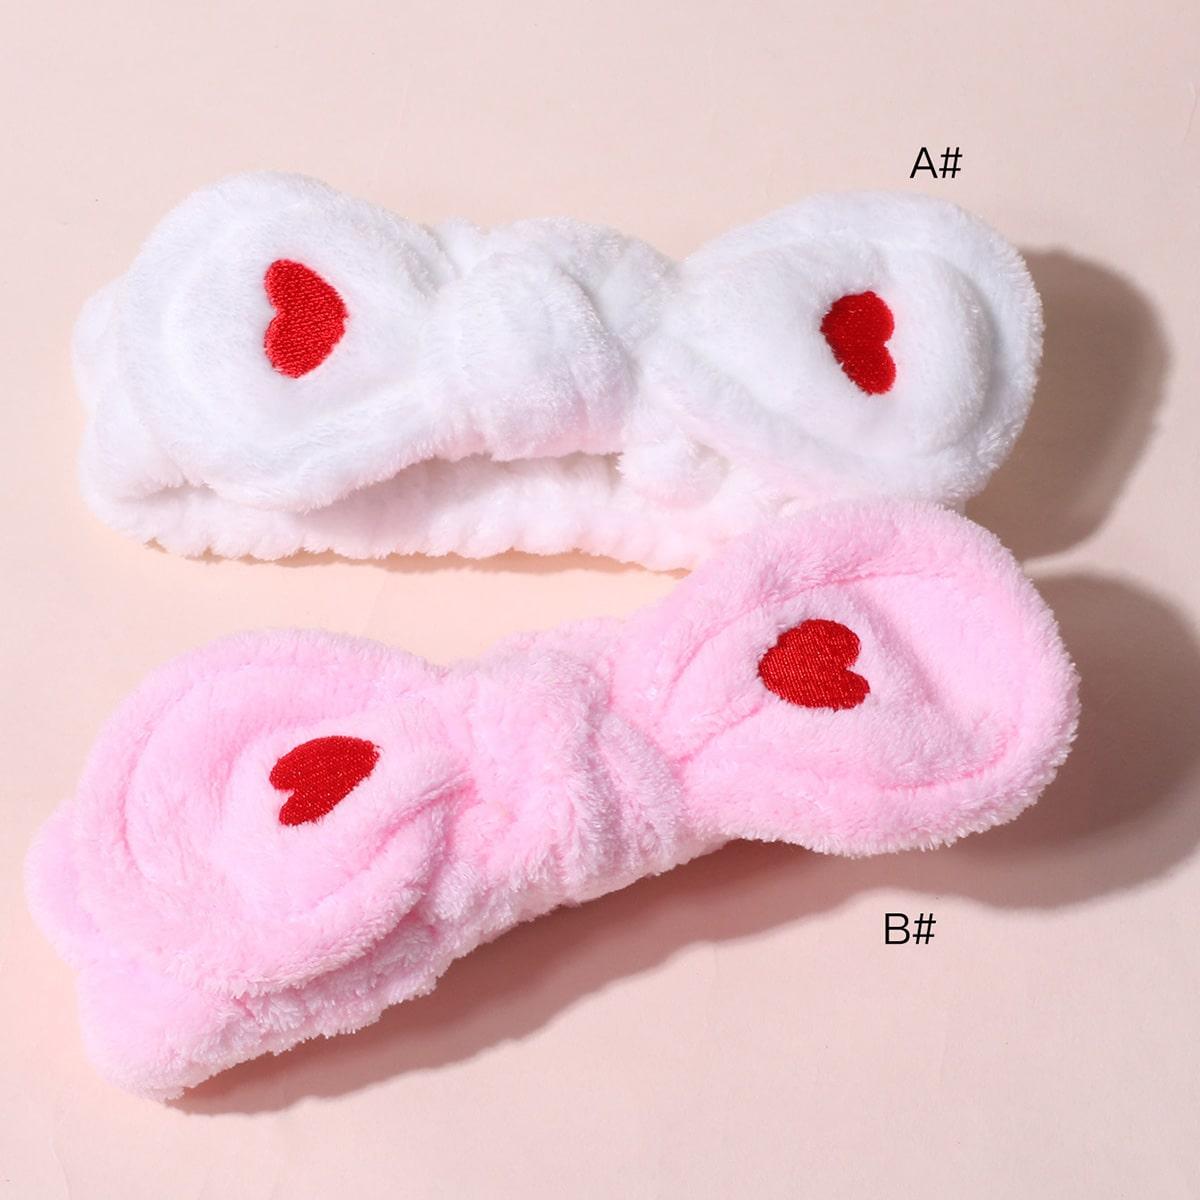 1-delige hartprint boogknoop badhoofdband